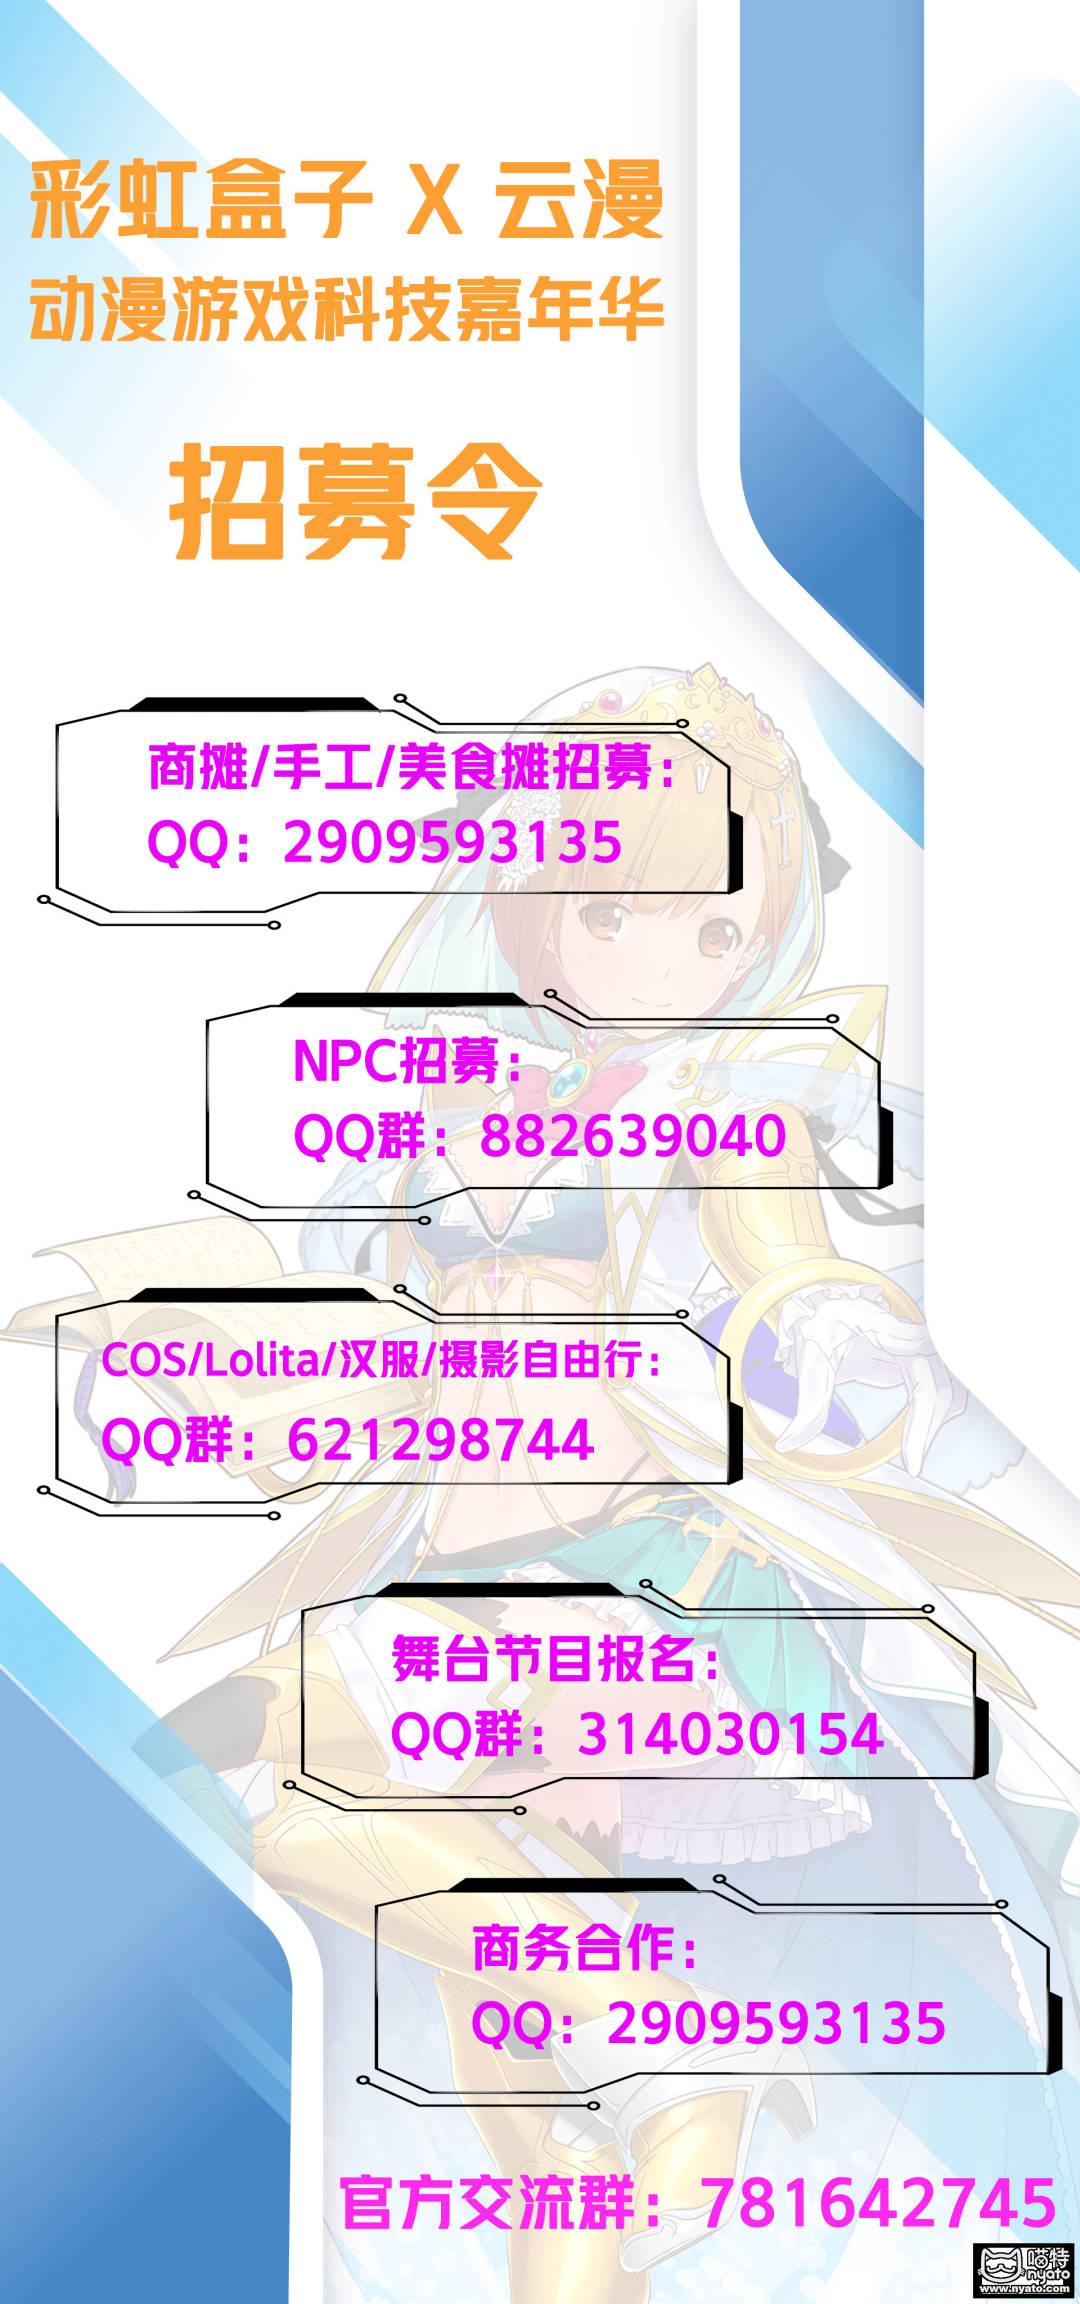 8-招募令.png